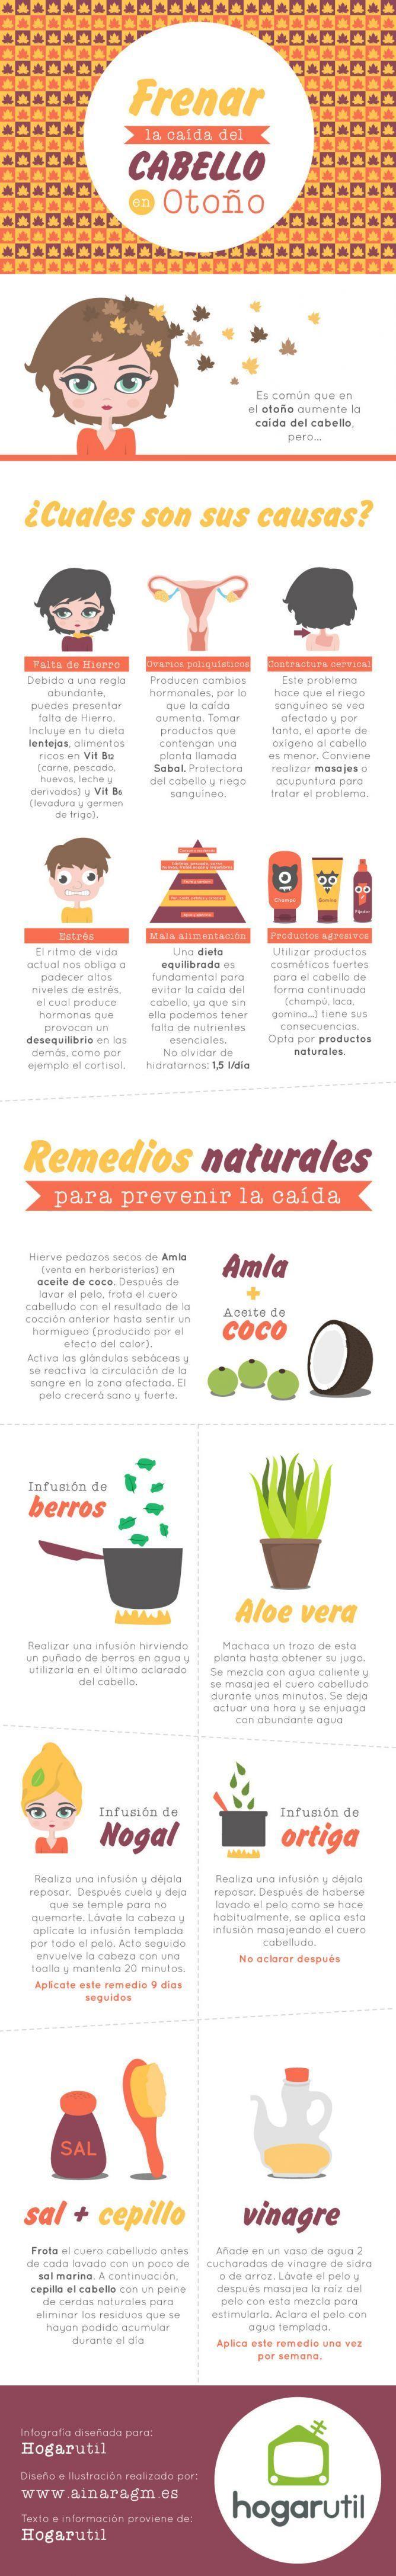 Remedios para frenar la perdida de cabello en otoño. #remedios #infografia #infographic